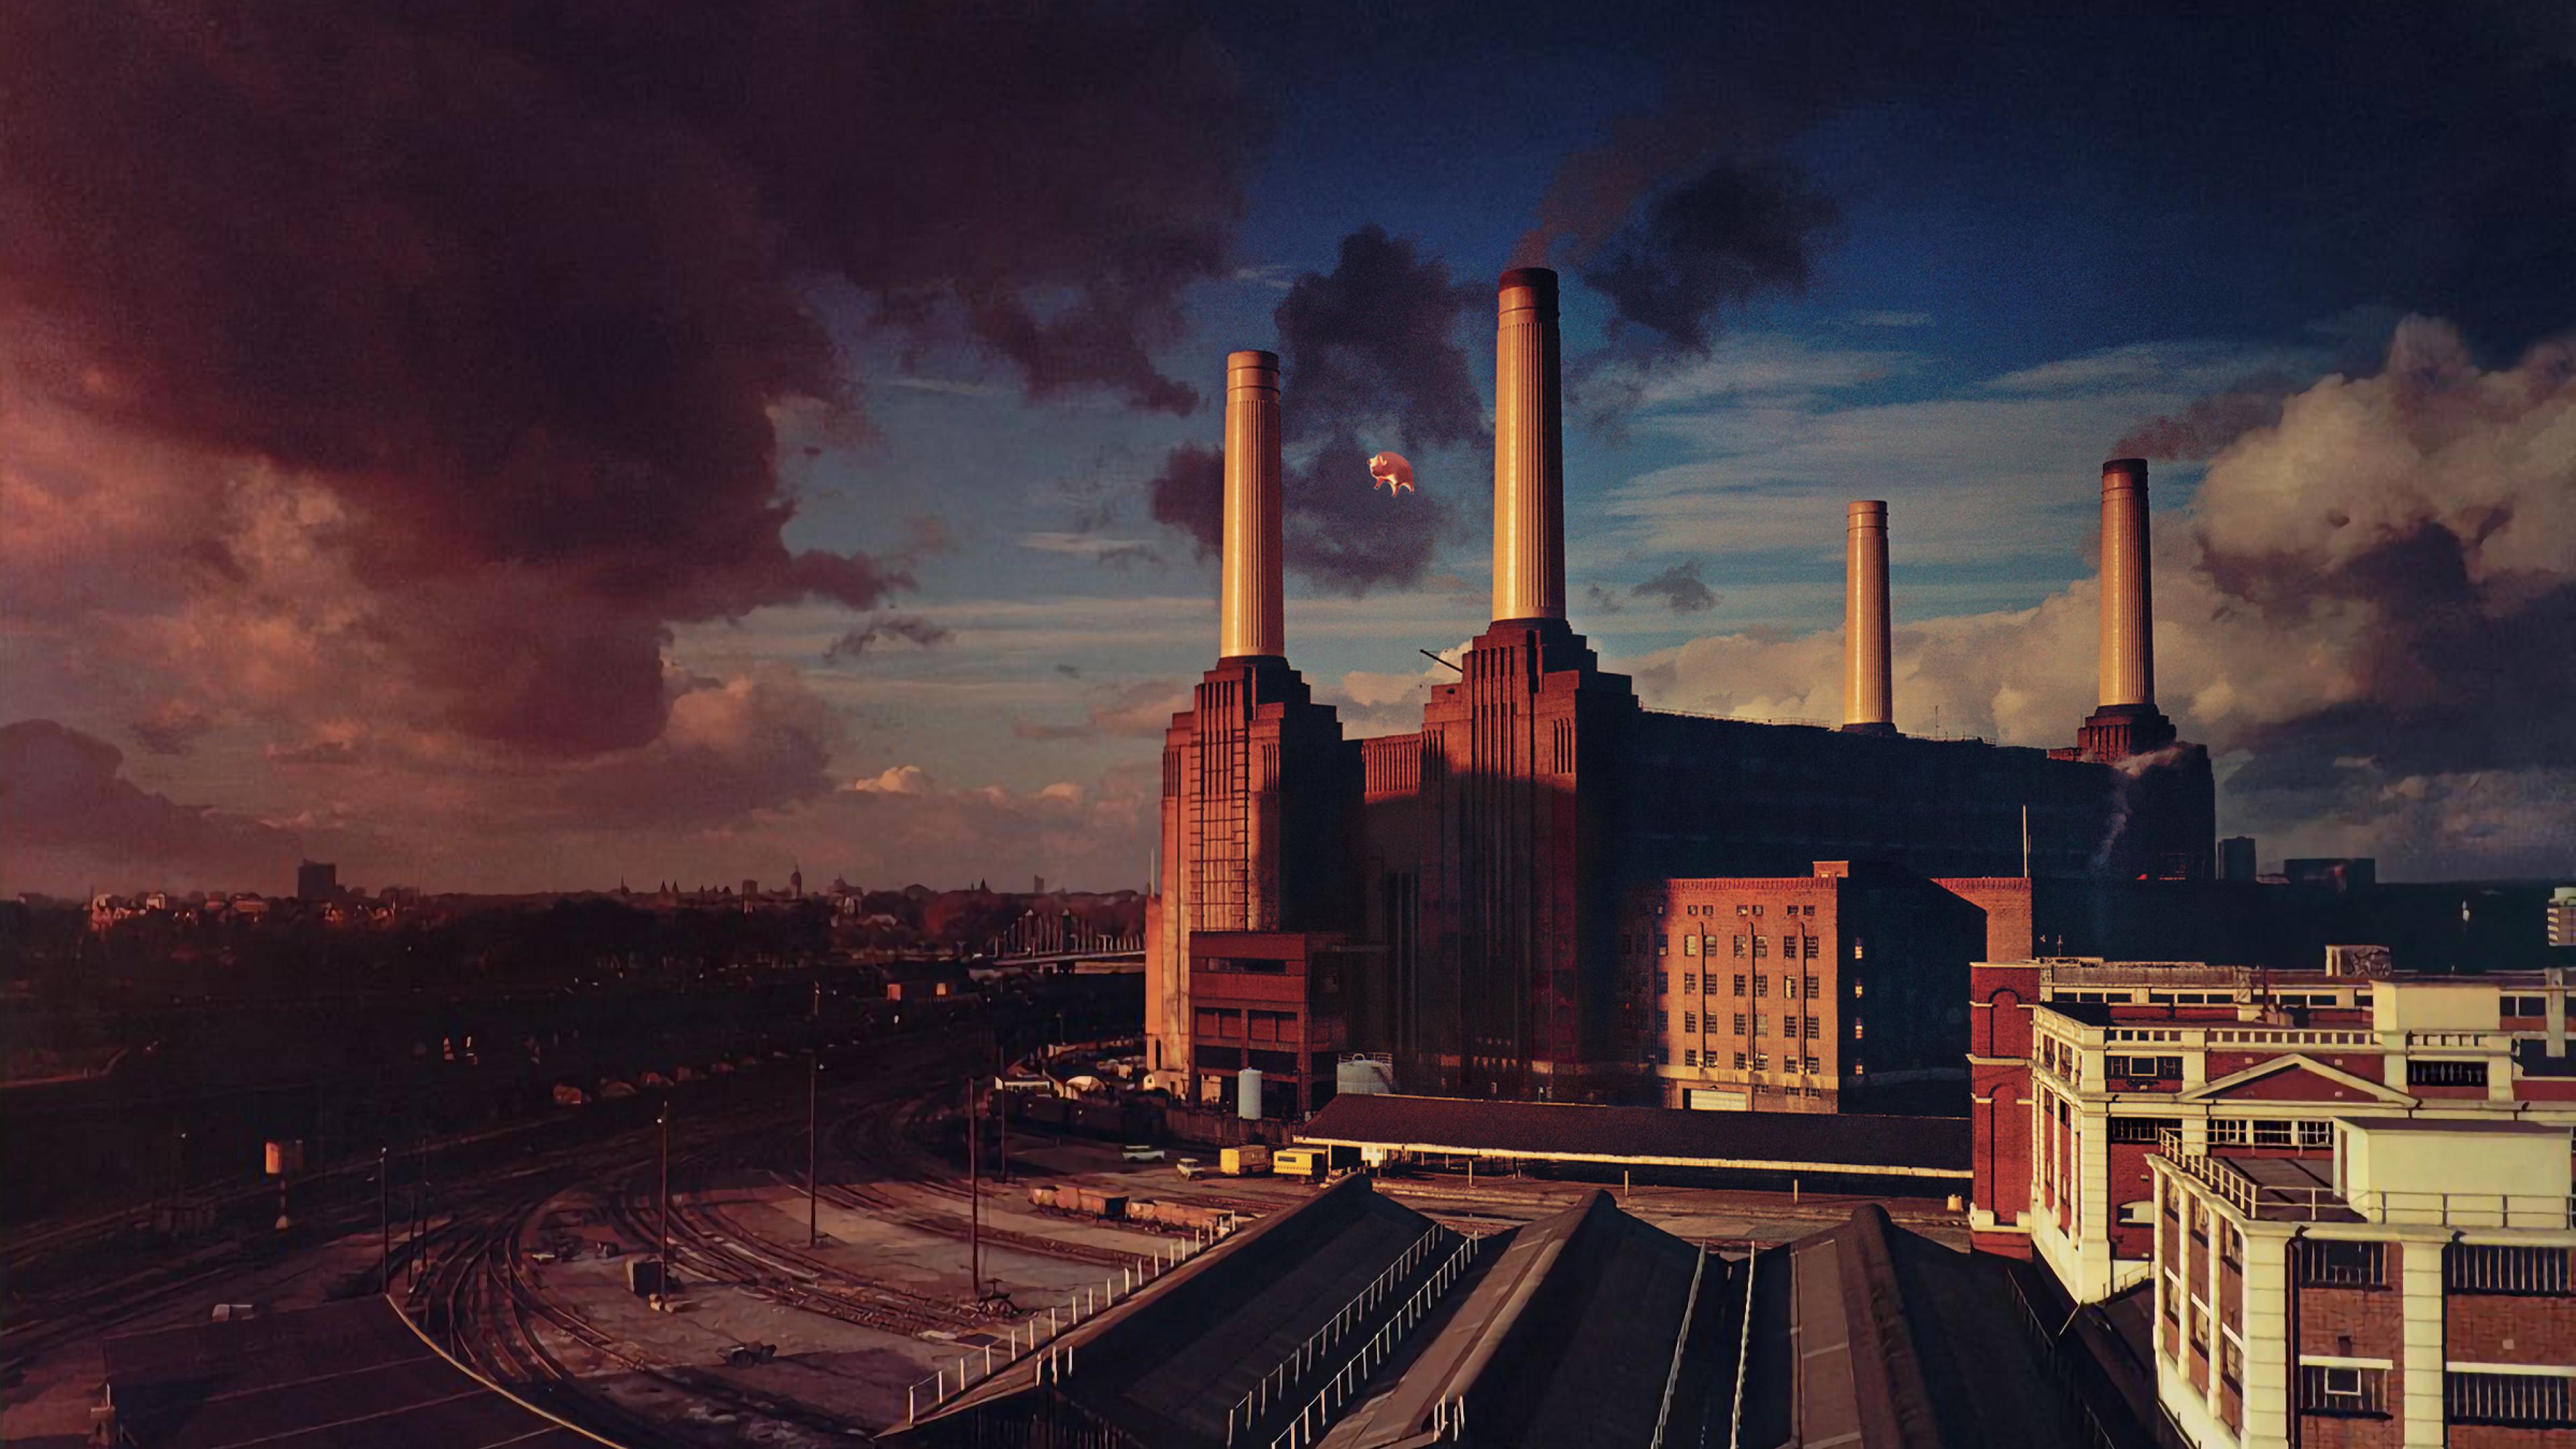 3840x2160 Pink Floyd Animals Album Cover 4k Wallpaper Hd Music 4k